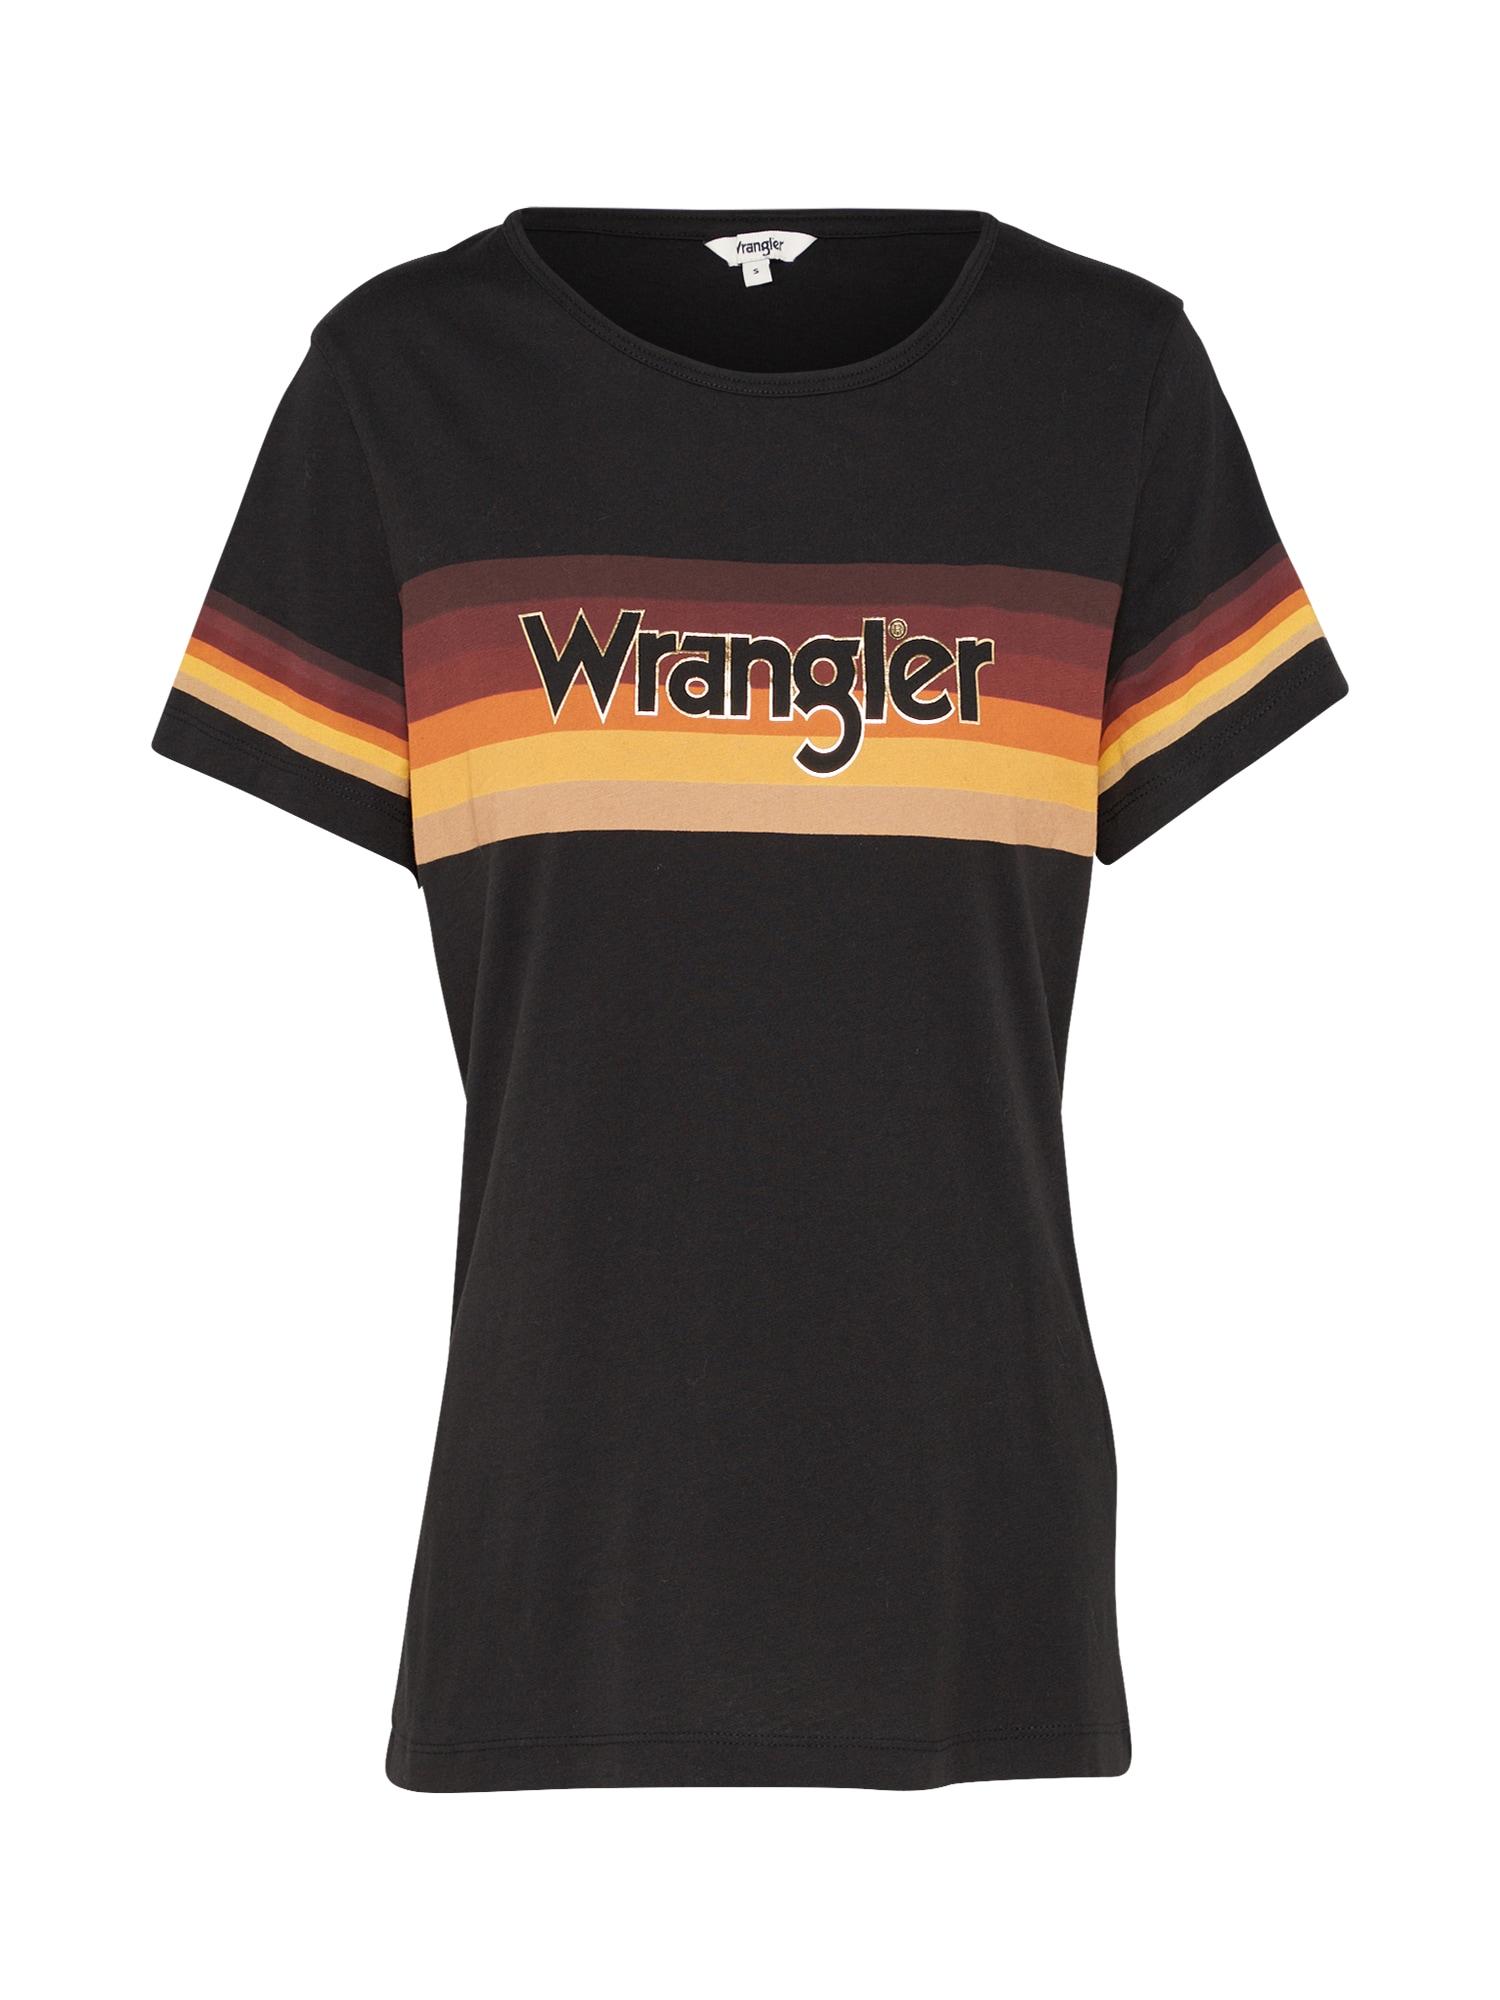 WRANGLER Dames Shirt RETRO RAINBOW geel donkeroranje zwart